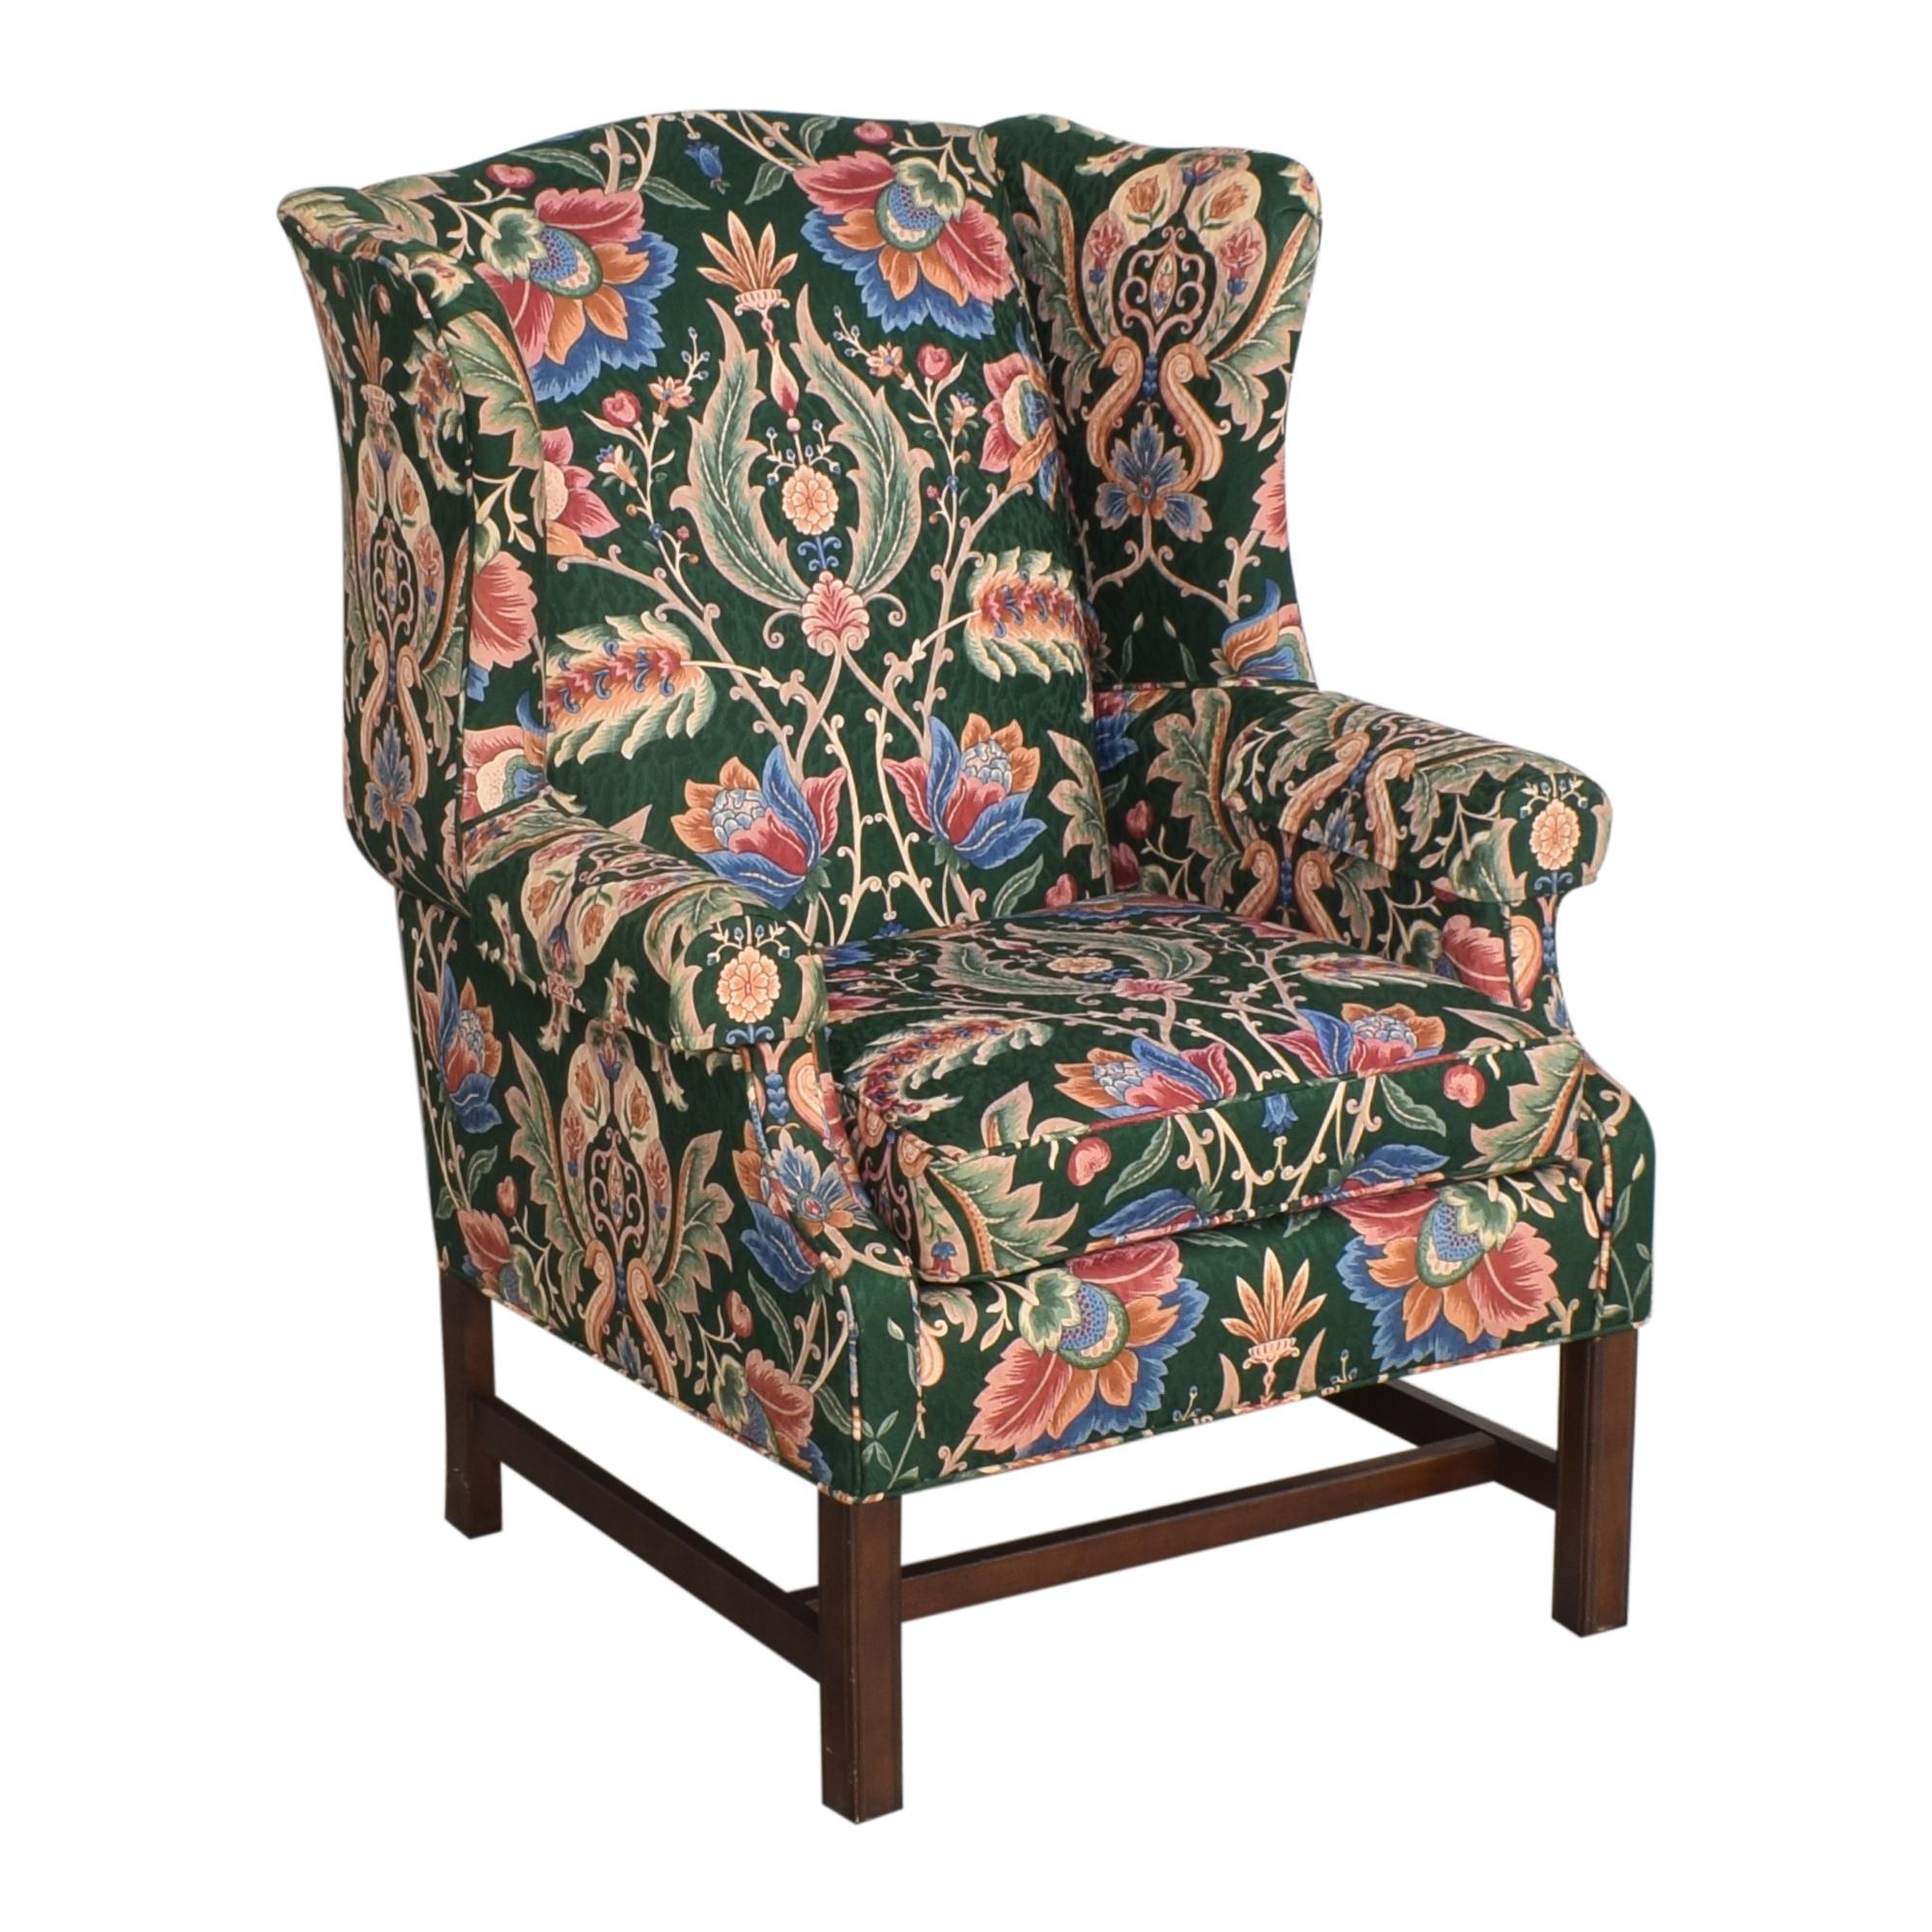 Ethan Allen Ethan Allen Skylar Wing Chair coupon